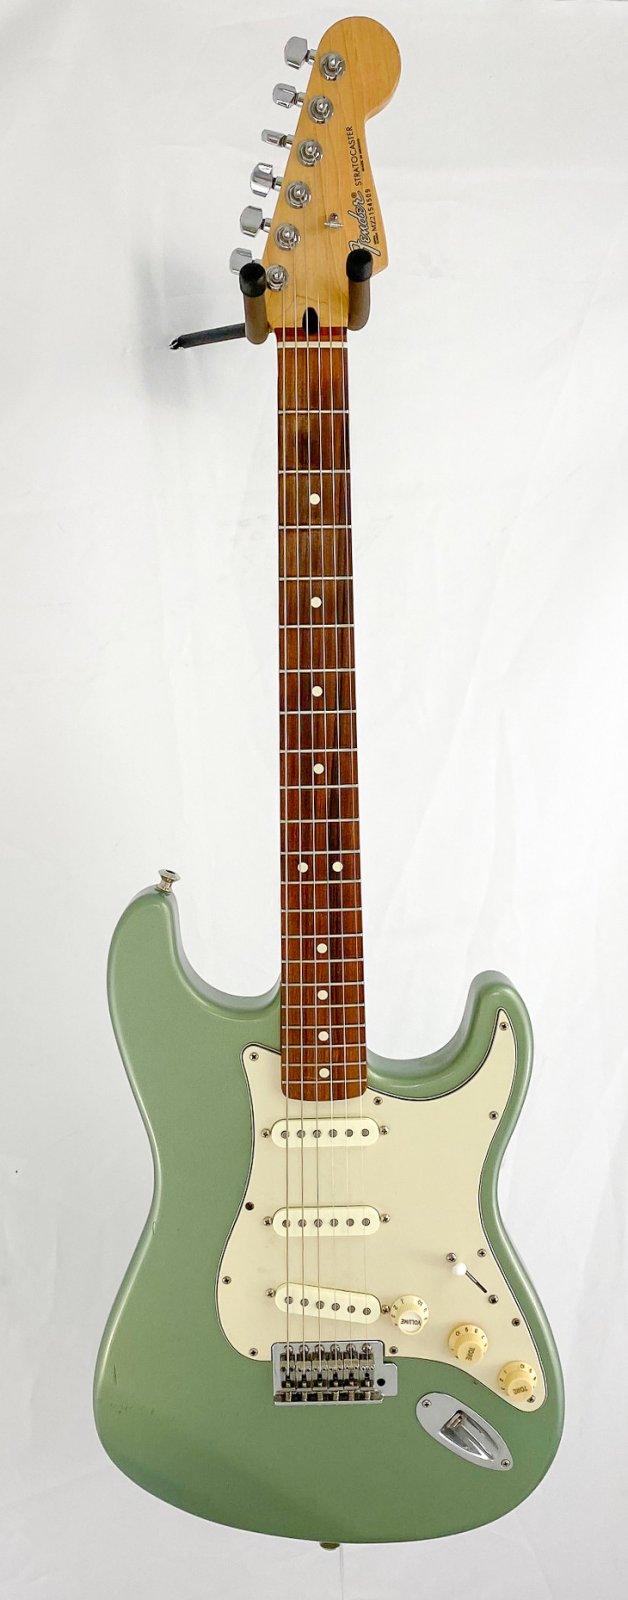 2002 Fender Standard Strat w/Fralin pickups + S1 switching -MIM